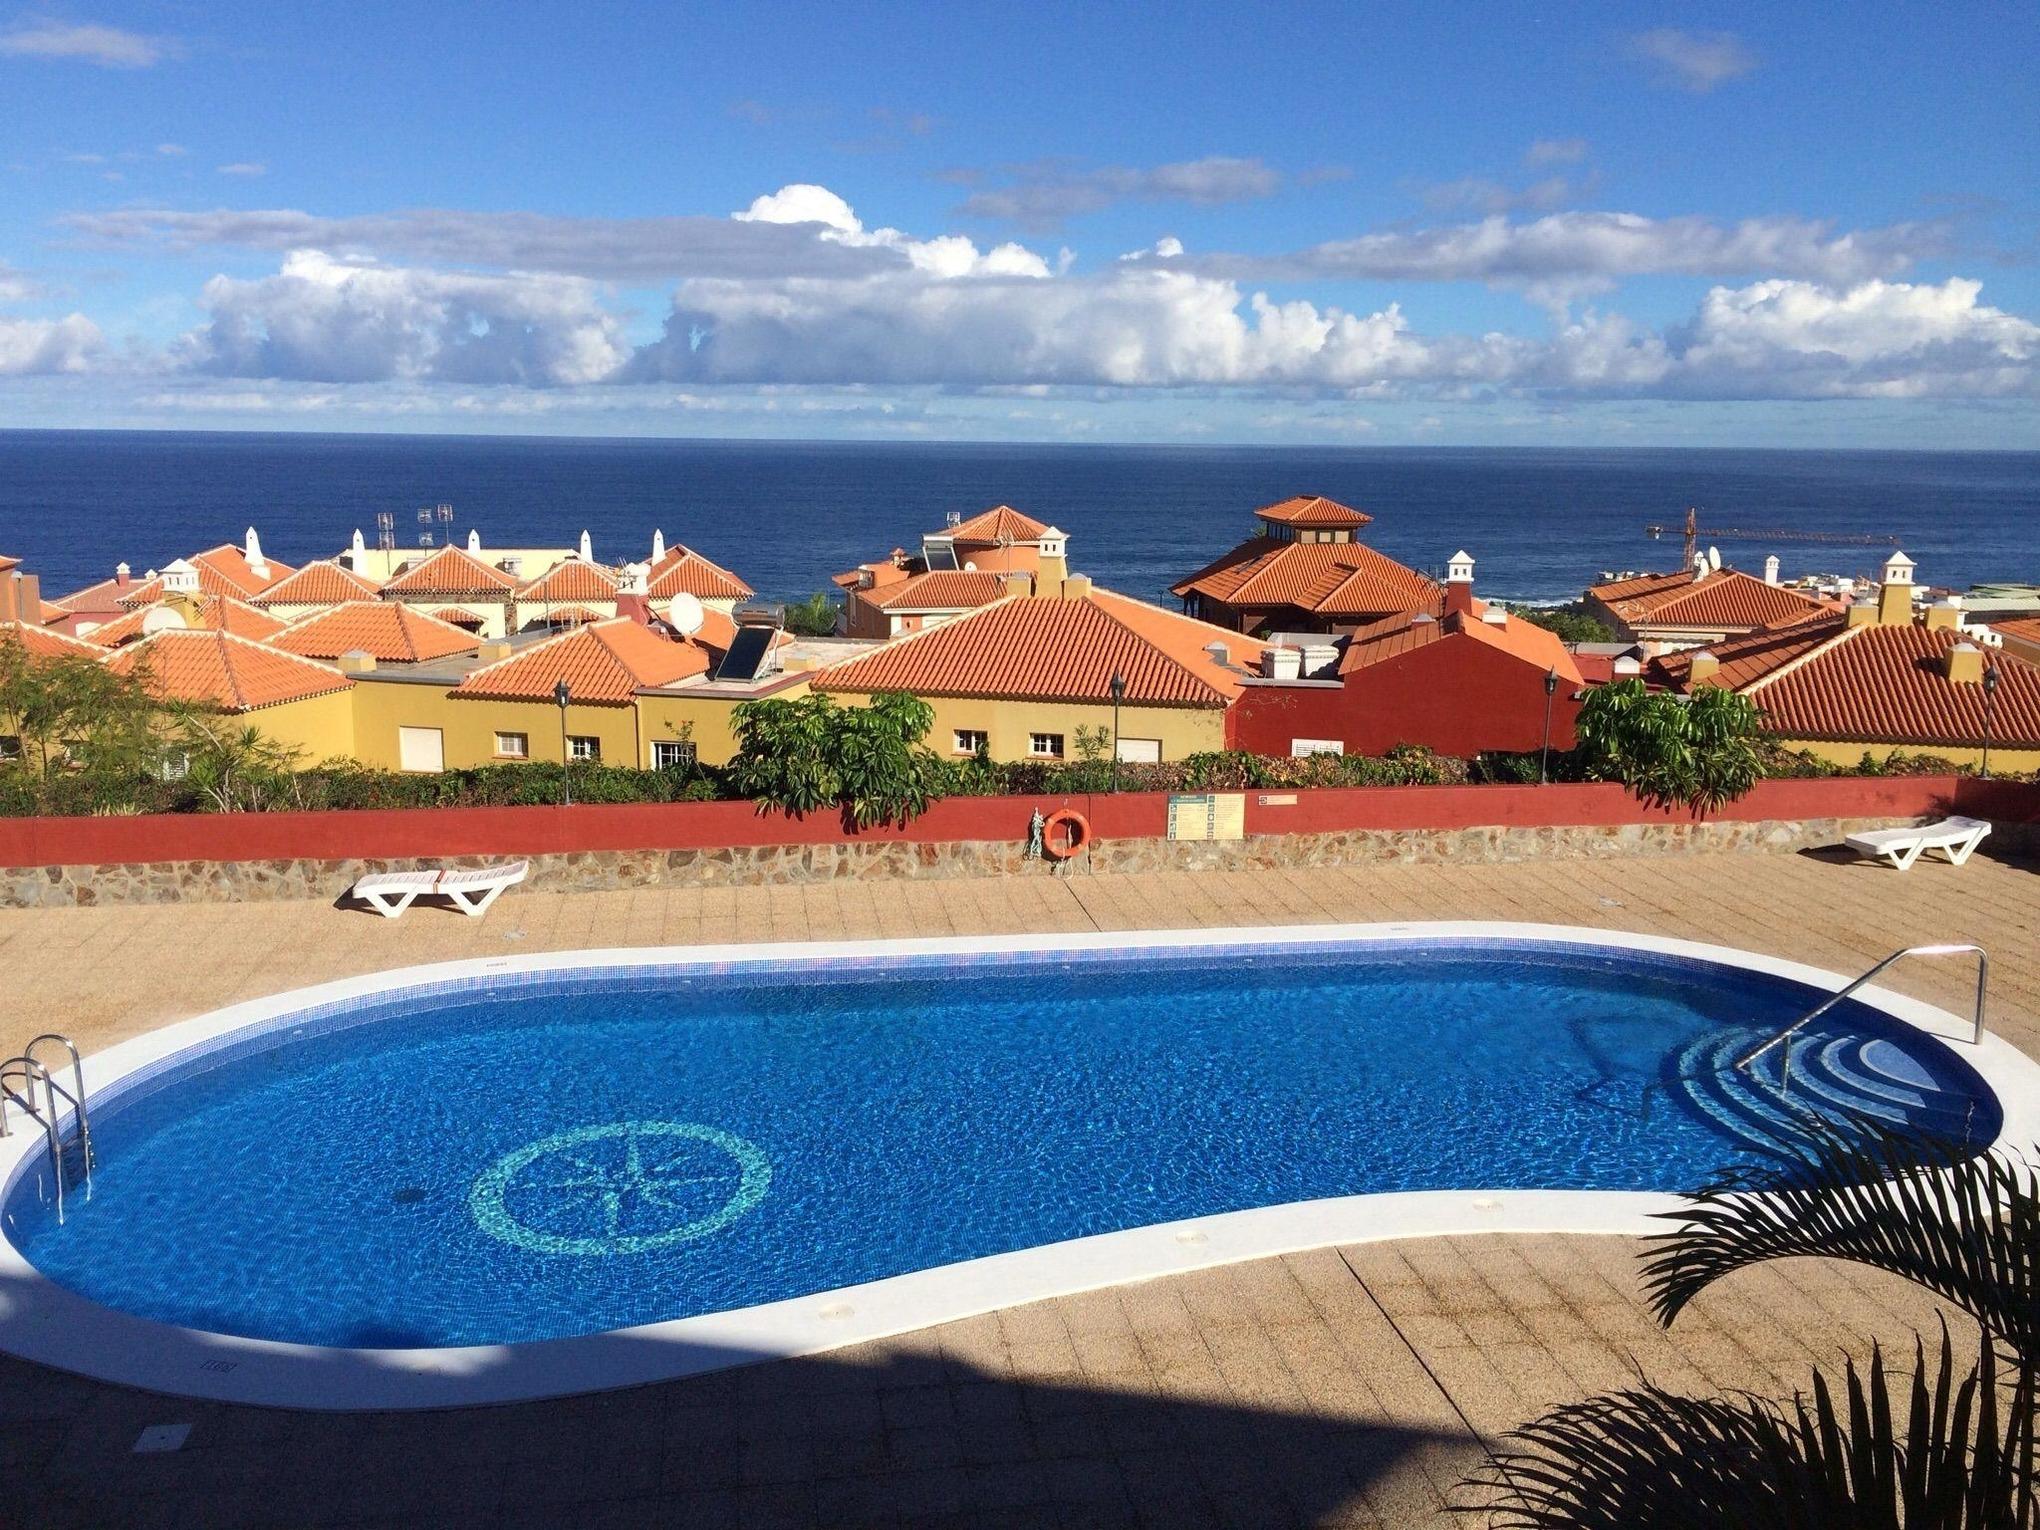 Appartement de vacances Fewo Playamar Romantico, Nähe Strand, toller Meerblick, 2 Schlafzimmer, 2 Terrassen, Pool, (2492988), Puerto de la Cruz, Ténérife, Iles Canaries, Espagne, image 1